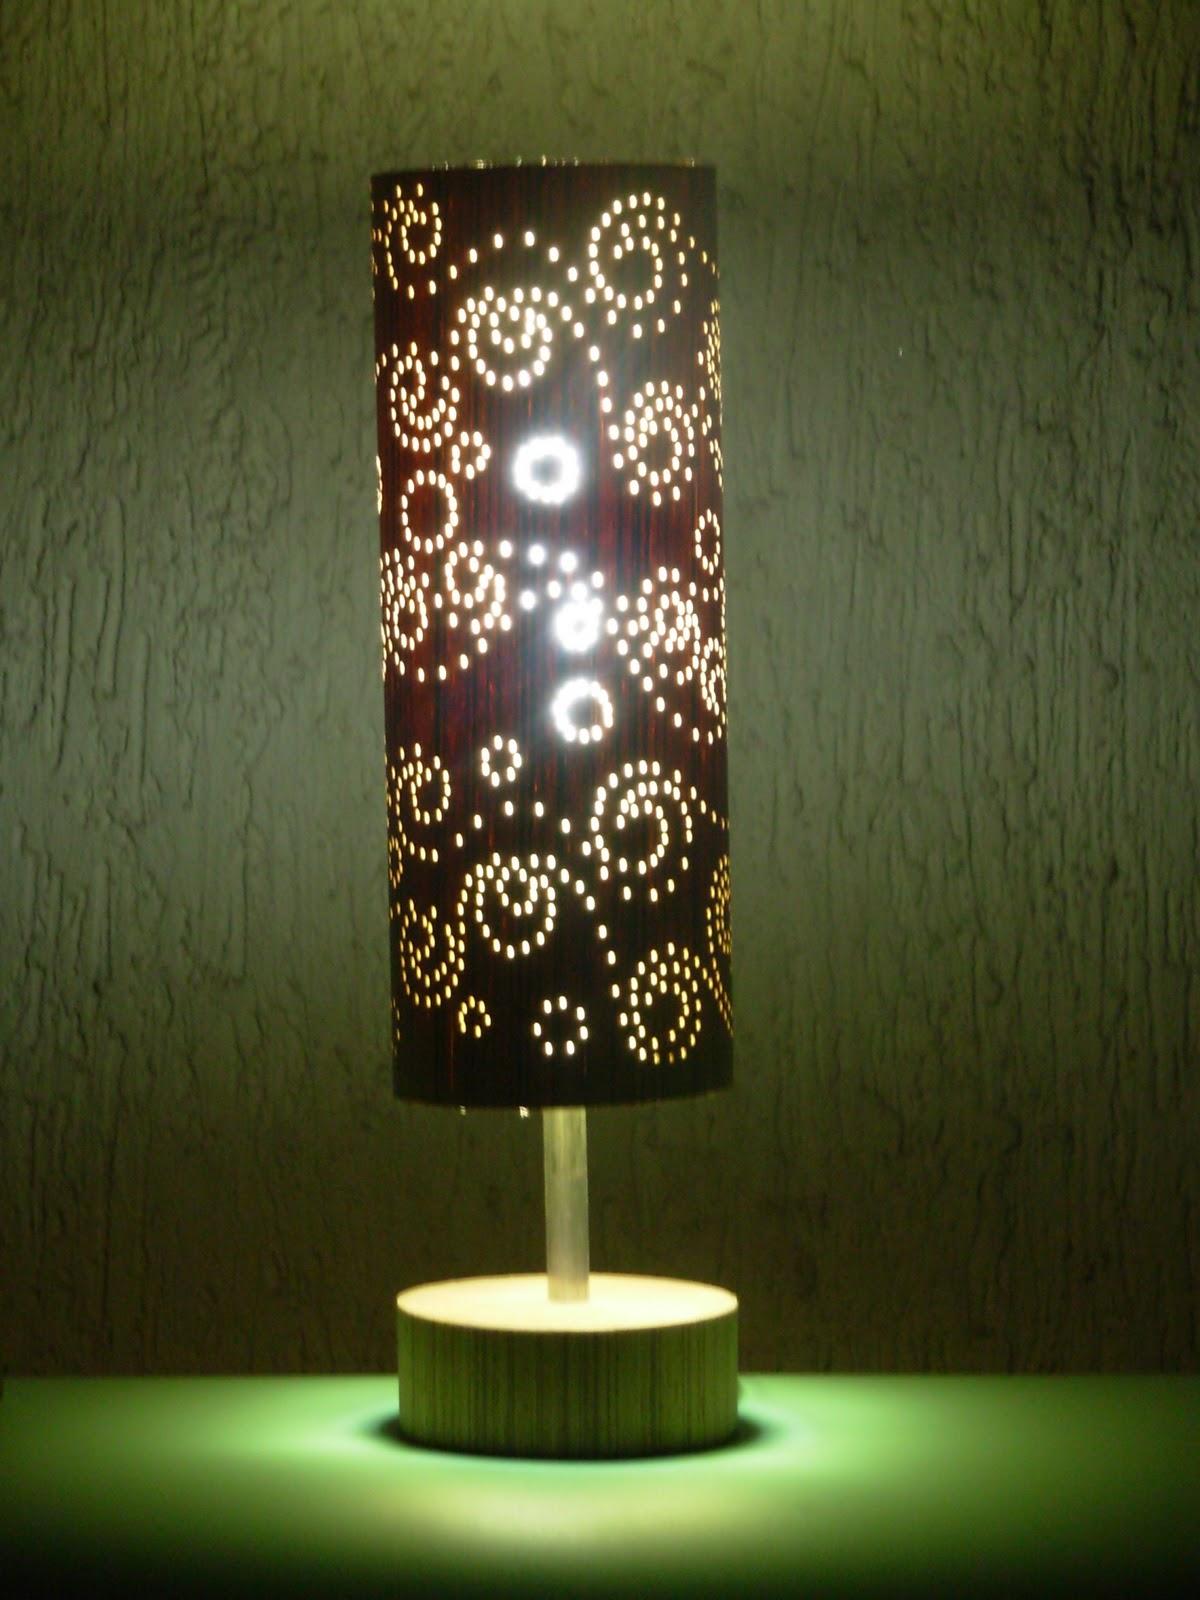 Aparador Vintage El Corte Ingles ~ Luminarias de Tubos PVC Aprenda Fazer lindas Luminarias de Tubos PVC